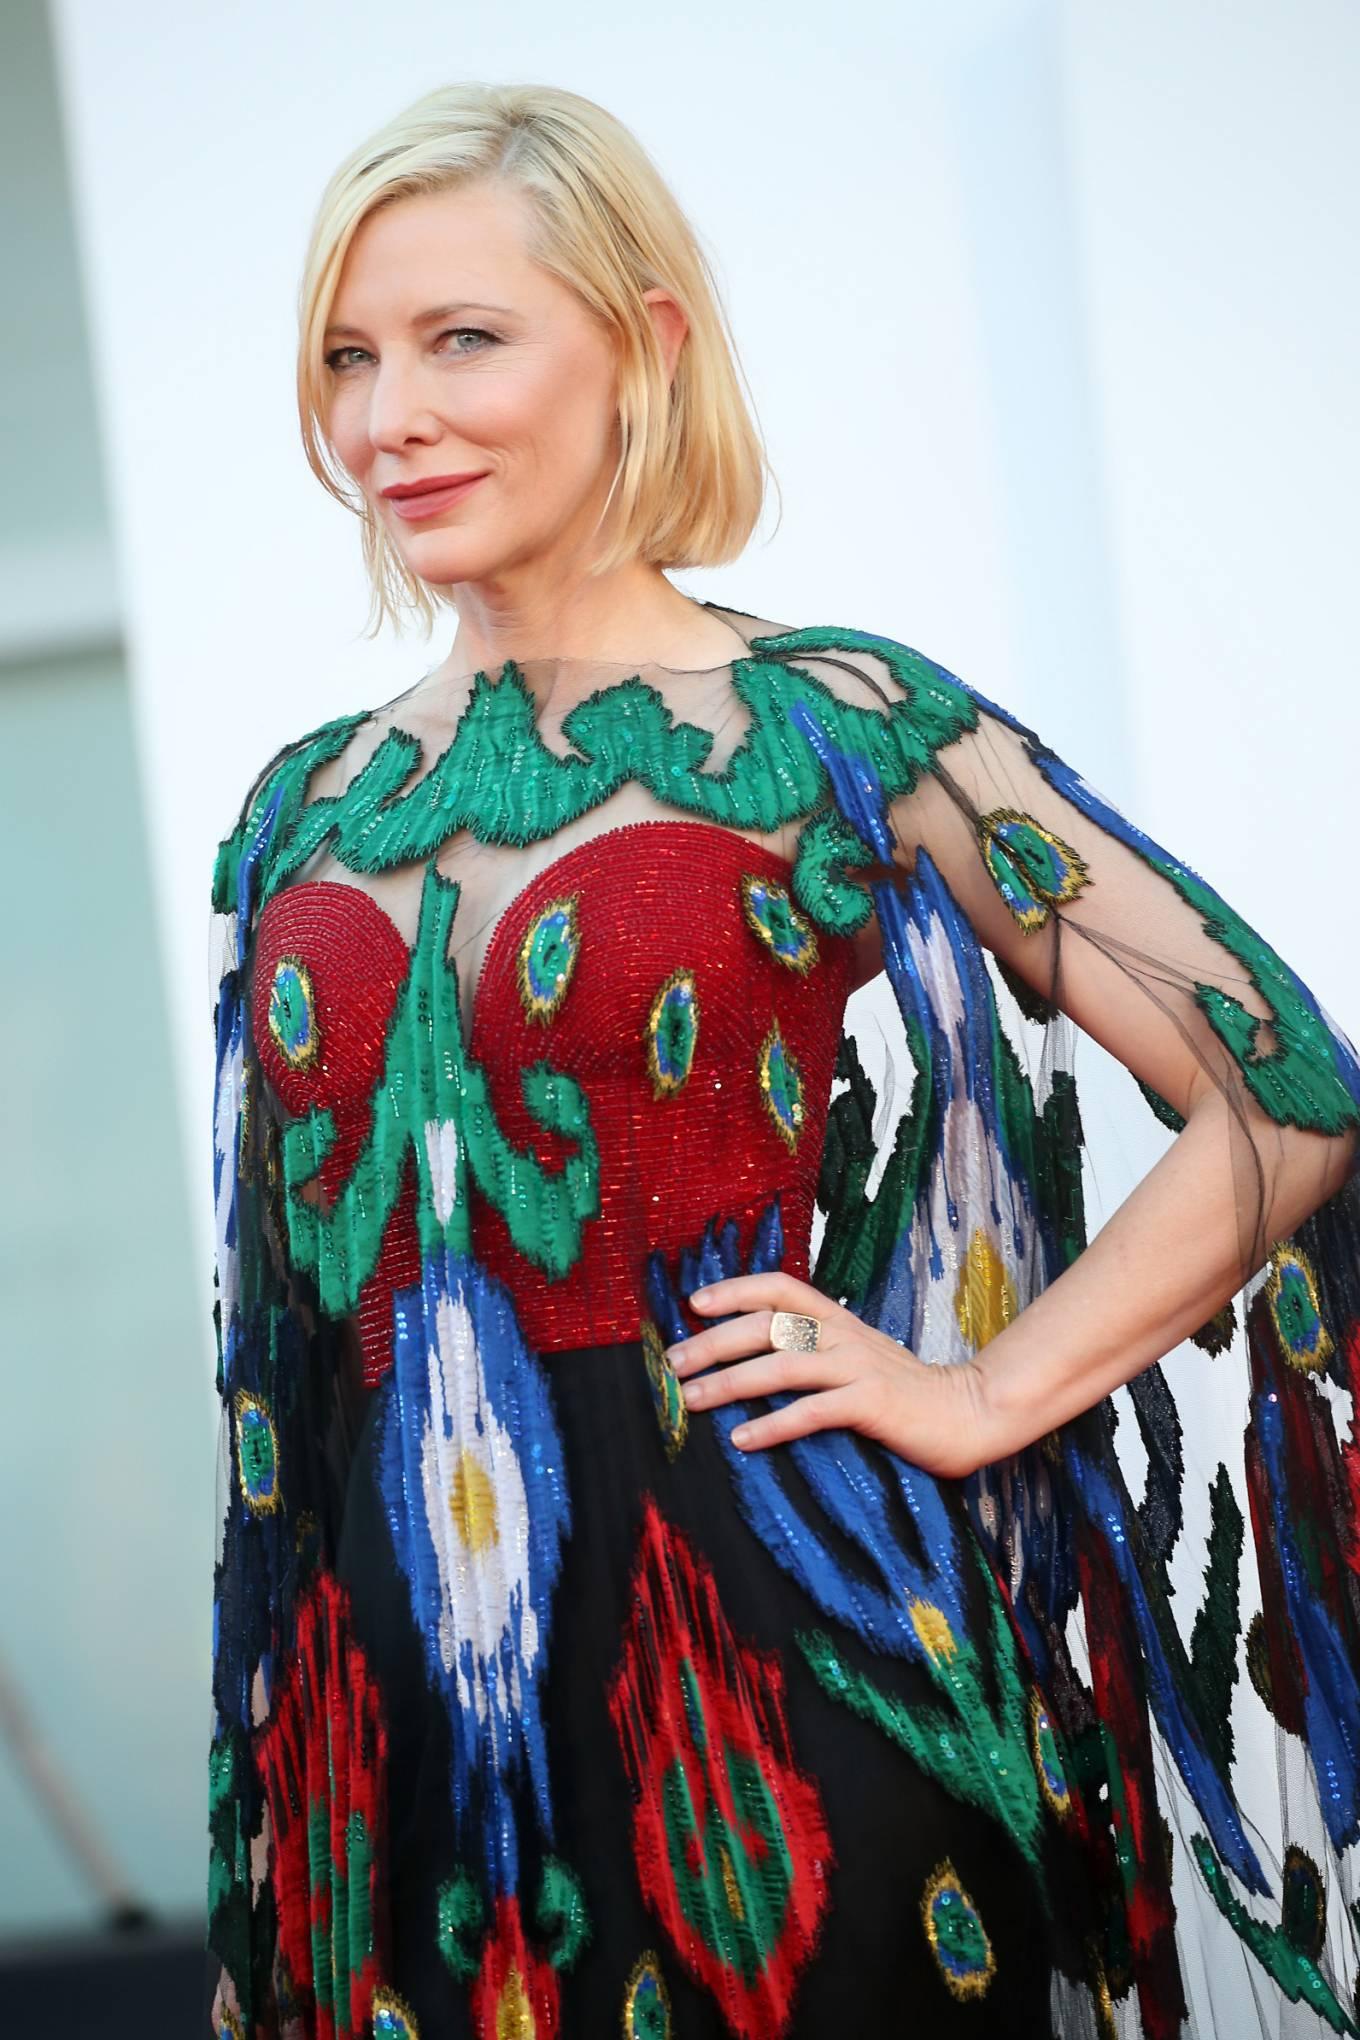 Cate Blanchett 2020 : Cate Blanchett – Closing Ceremony Red Carpet of 2020 Venice Film Festival in Venice-13